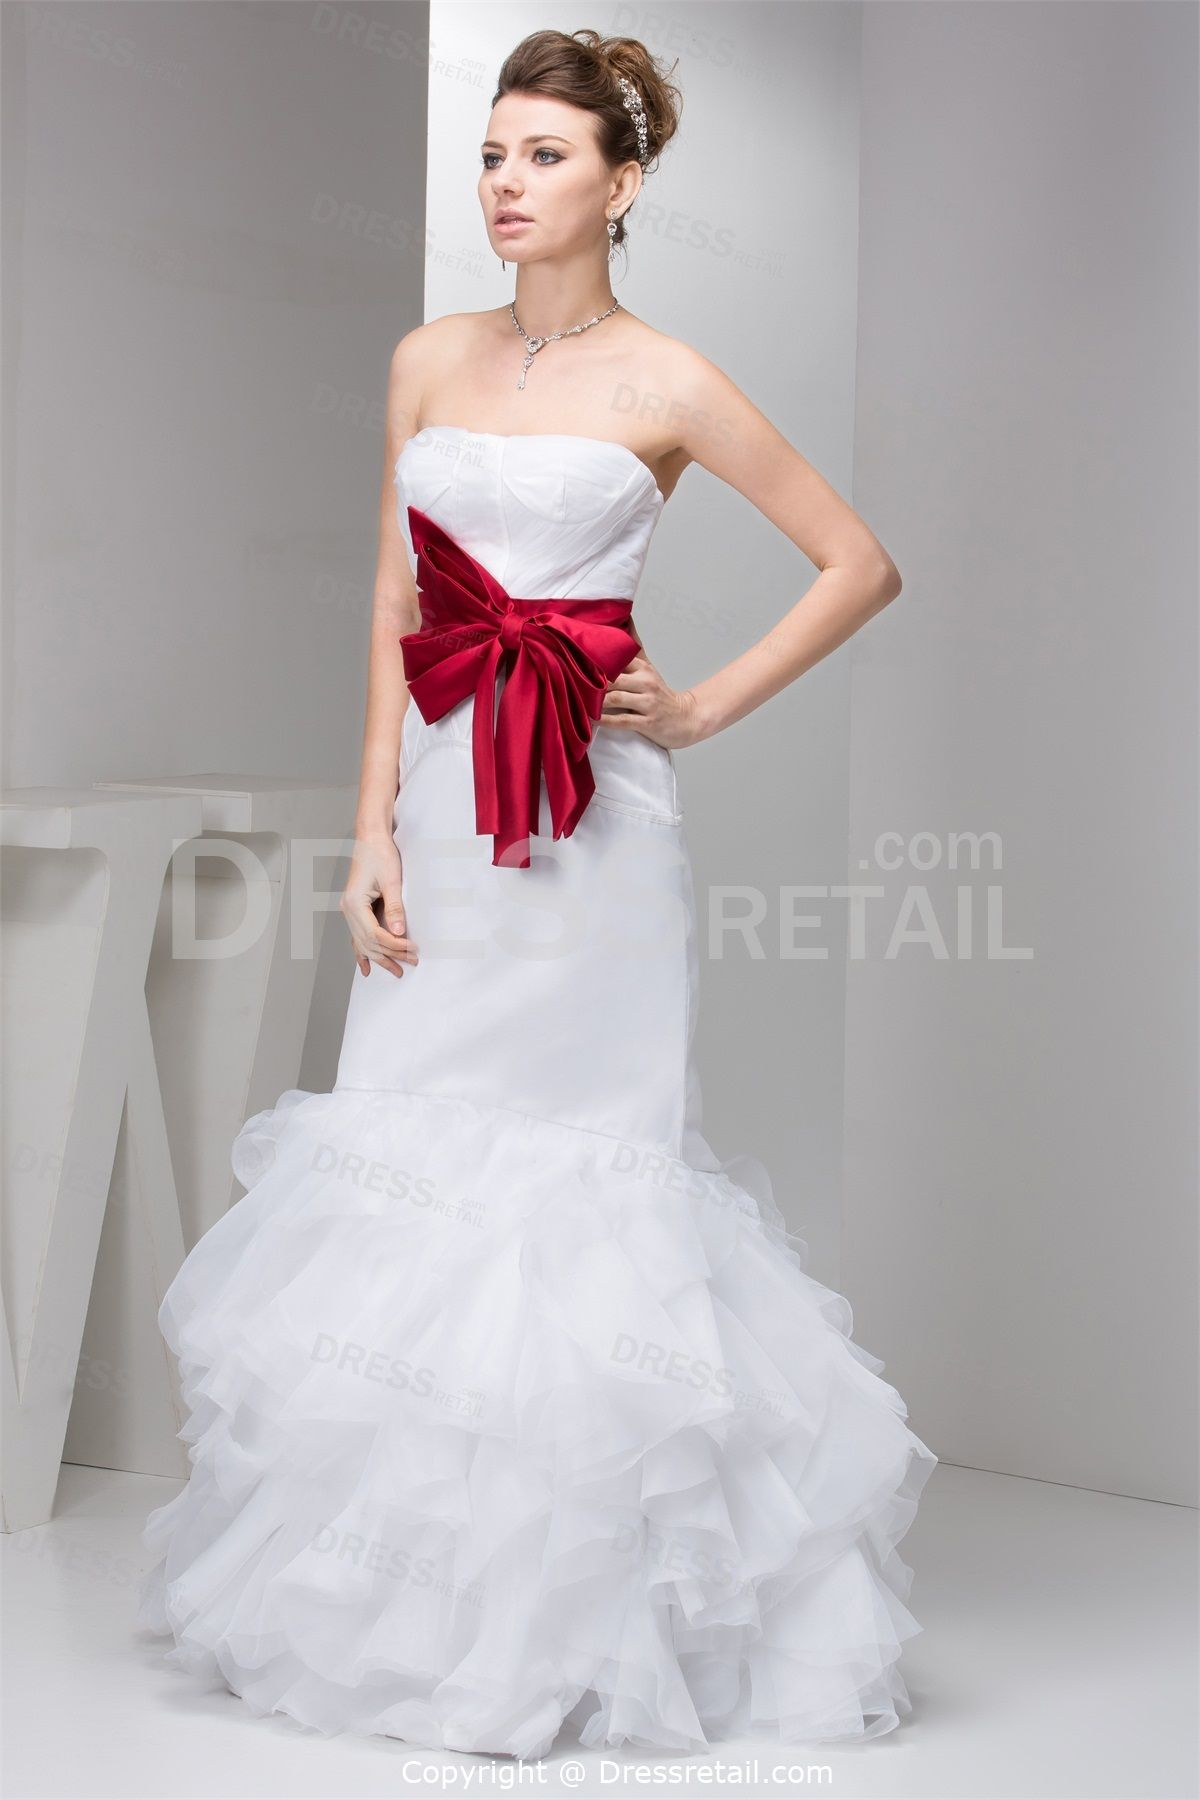 Wonderful White Red Mermaid Strapless Summer Wedding Dress